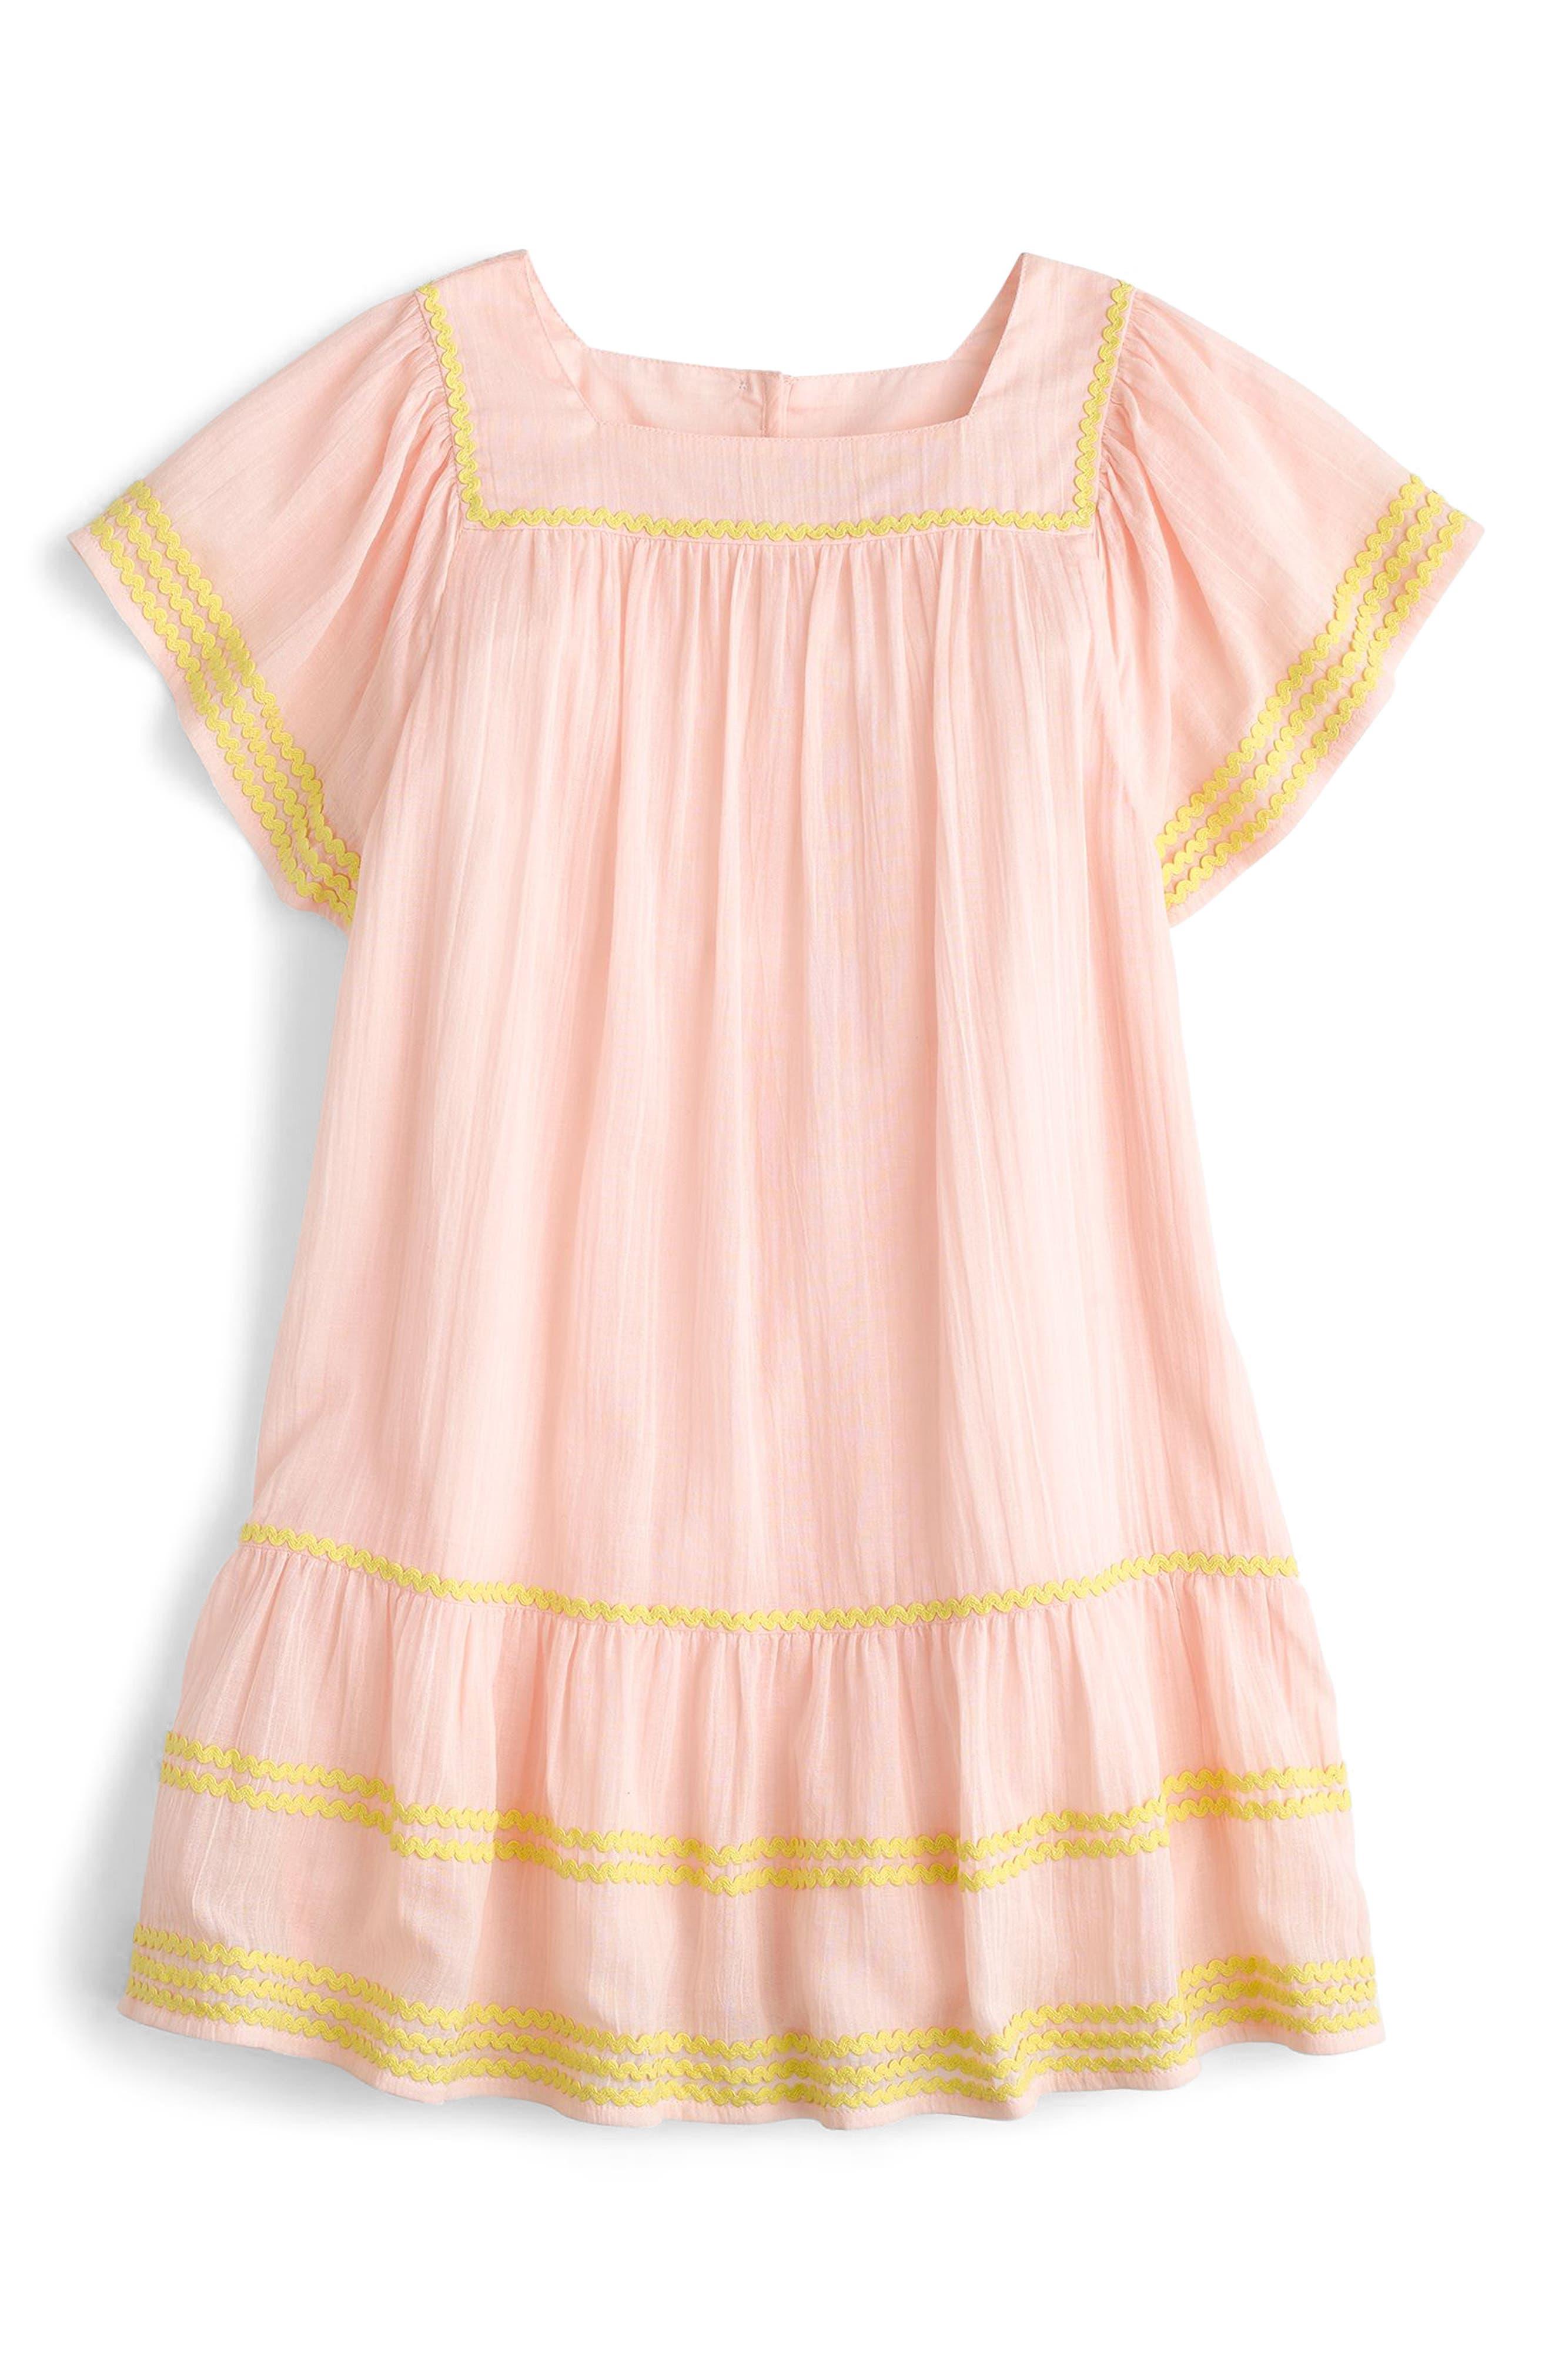 Bardot Cotton Dress,                             Main thumbnail 1, color,                             651